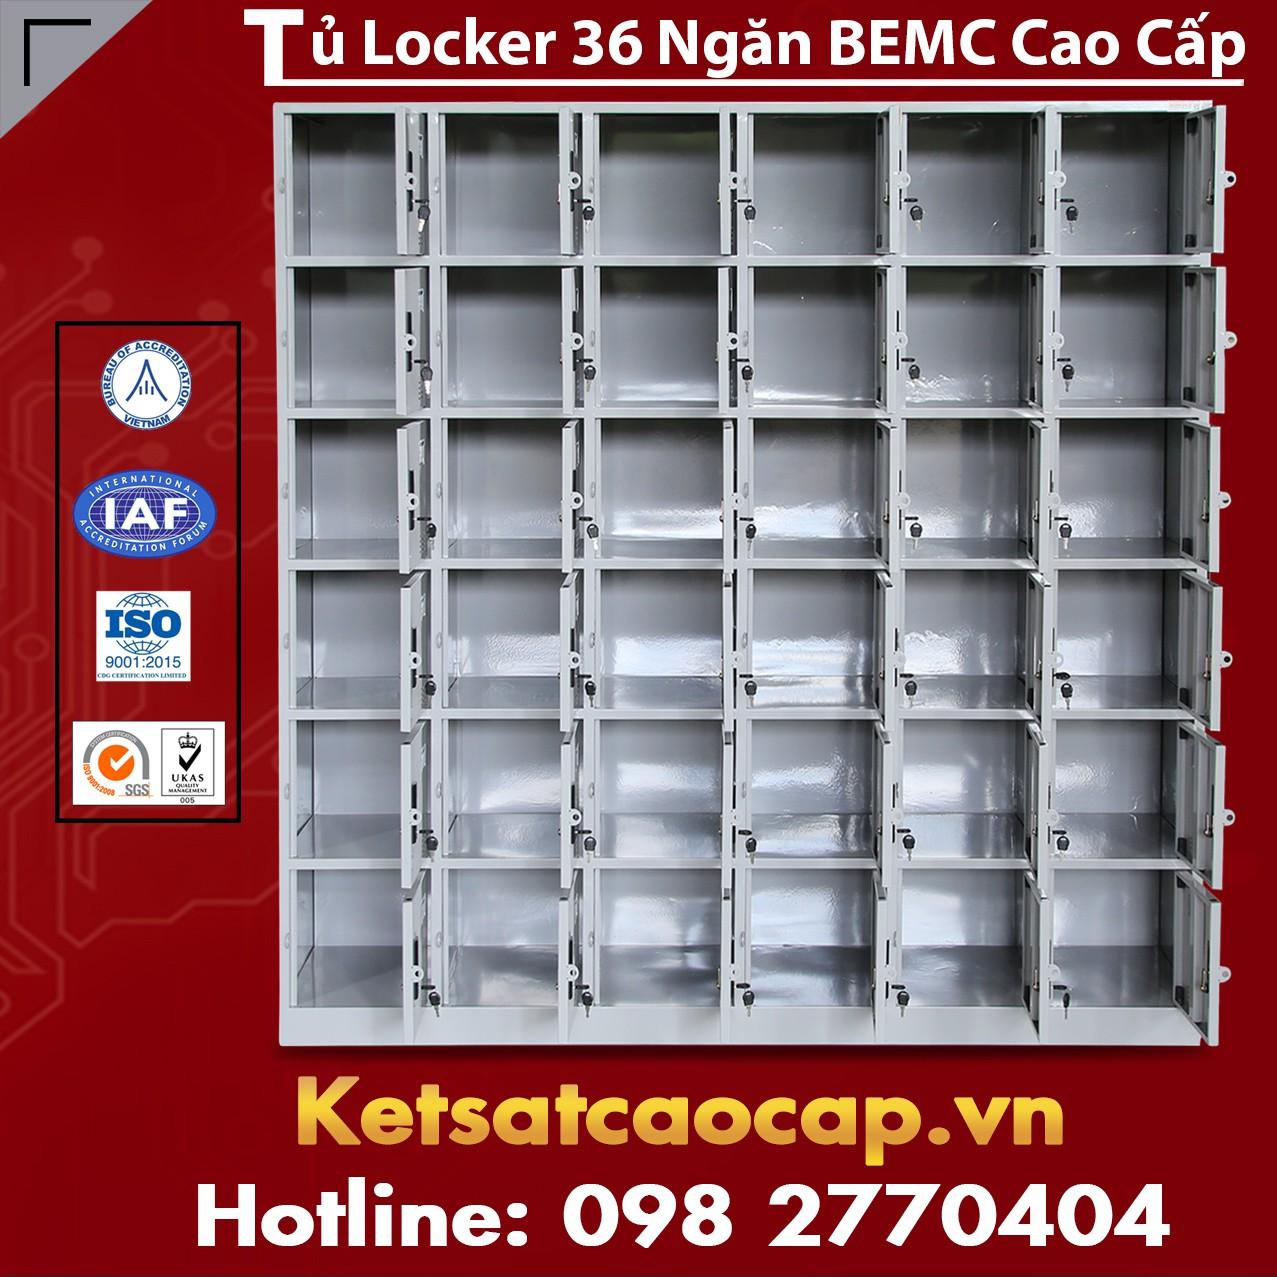 Tủ Locker BEMC Nhiều Mẫu Mã